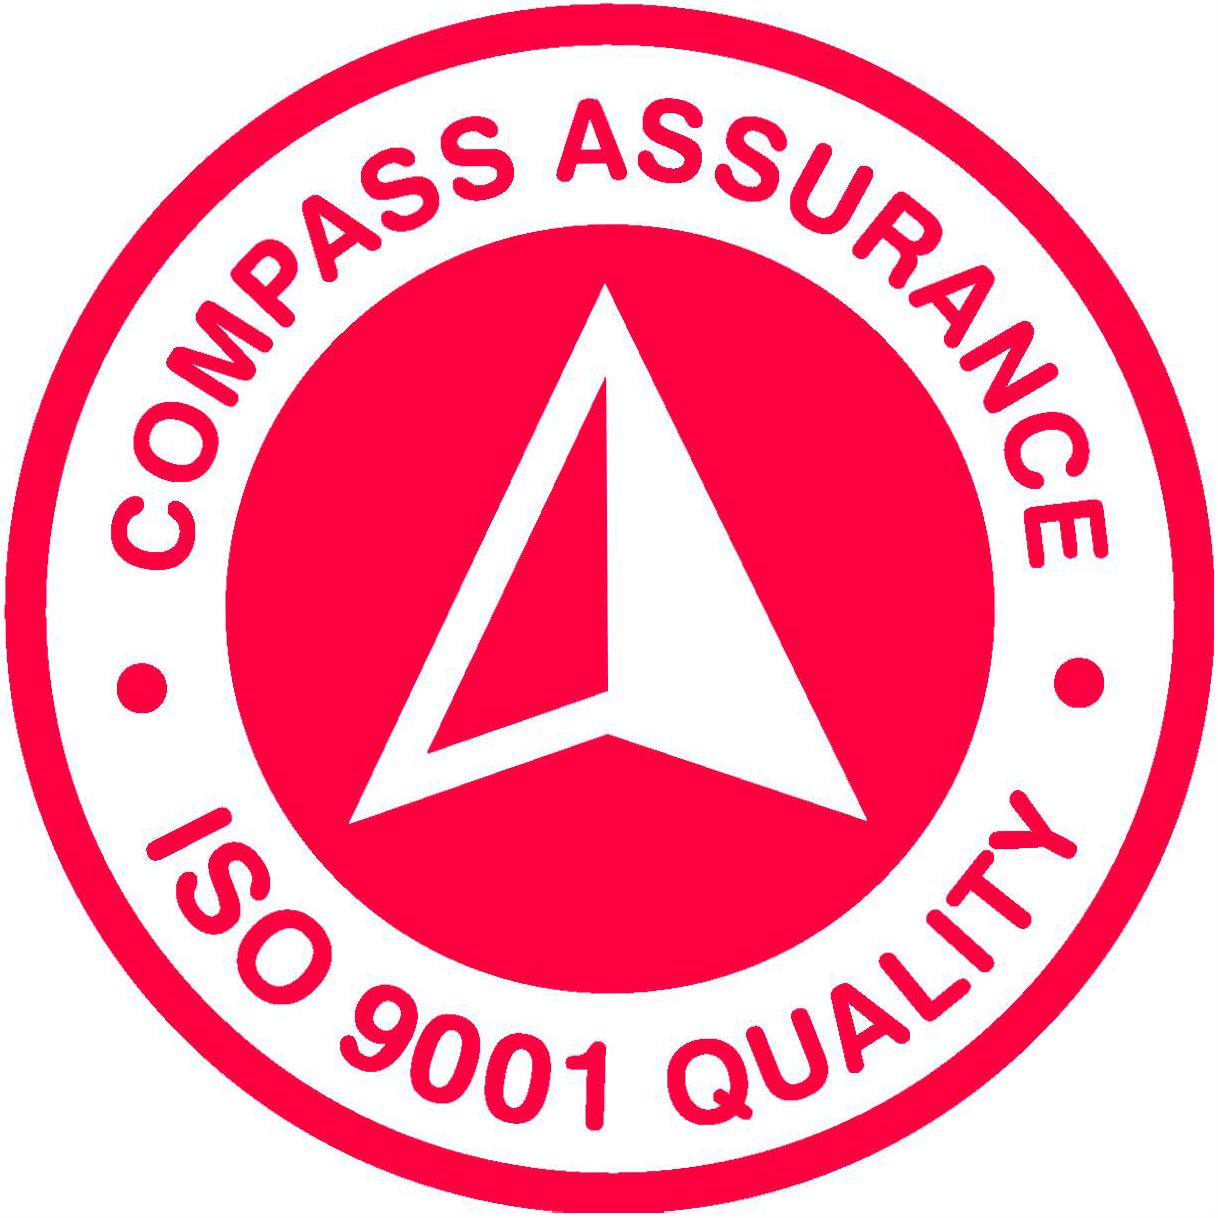 Compass circle